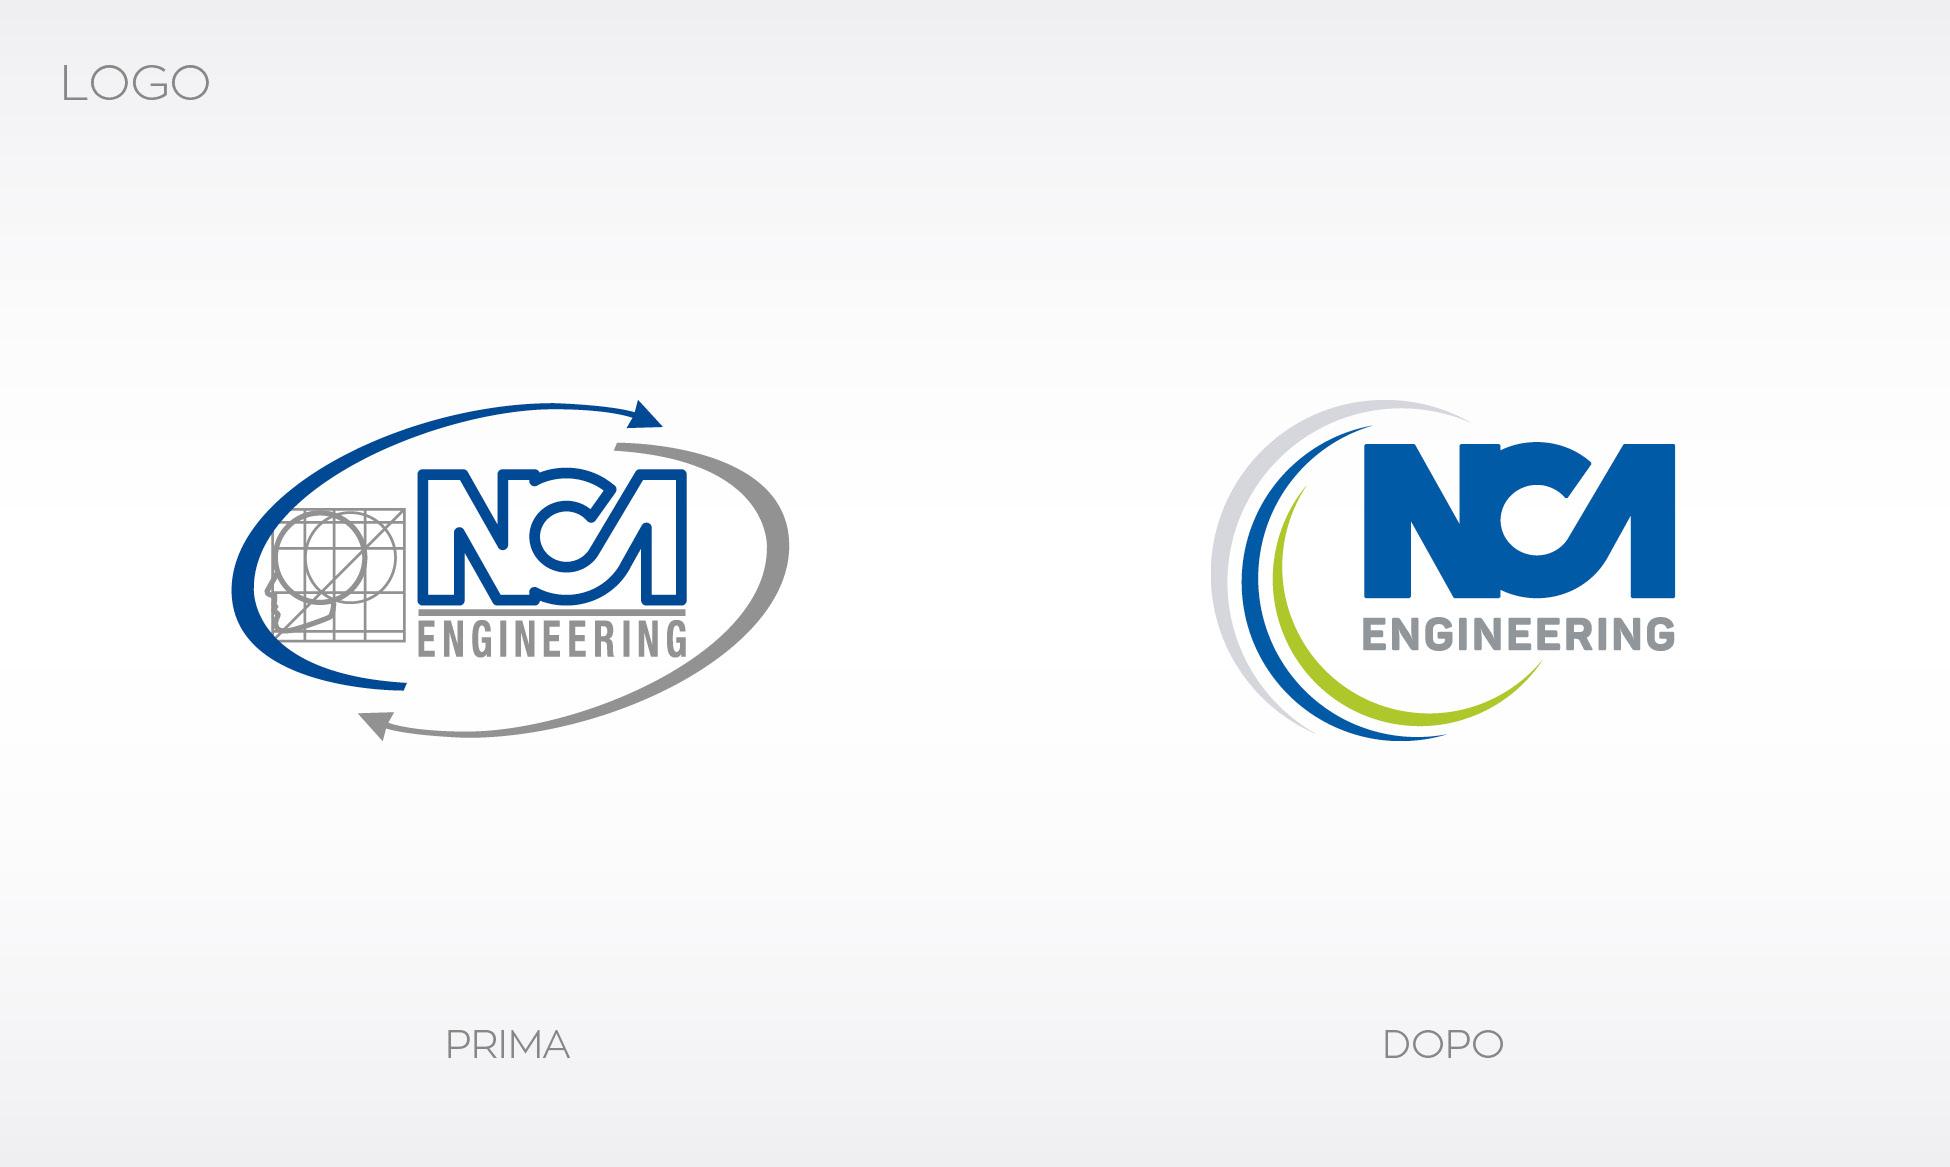 HORAdesign-NCA_12